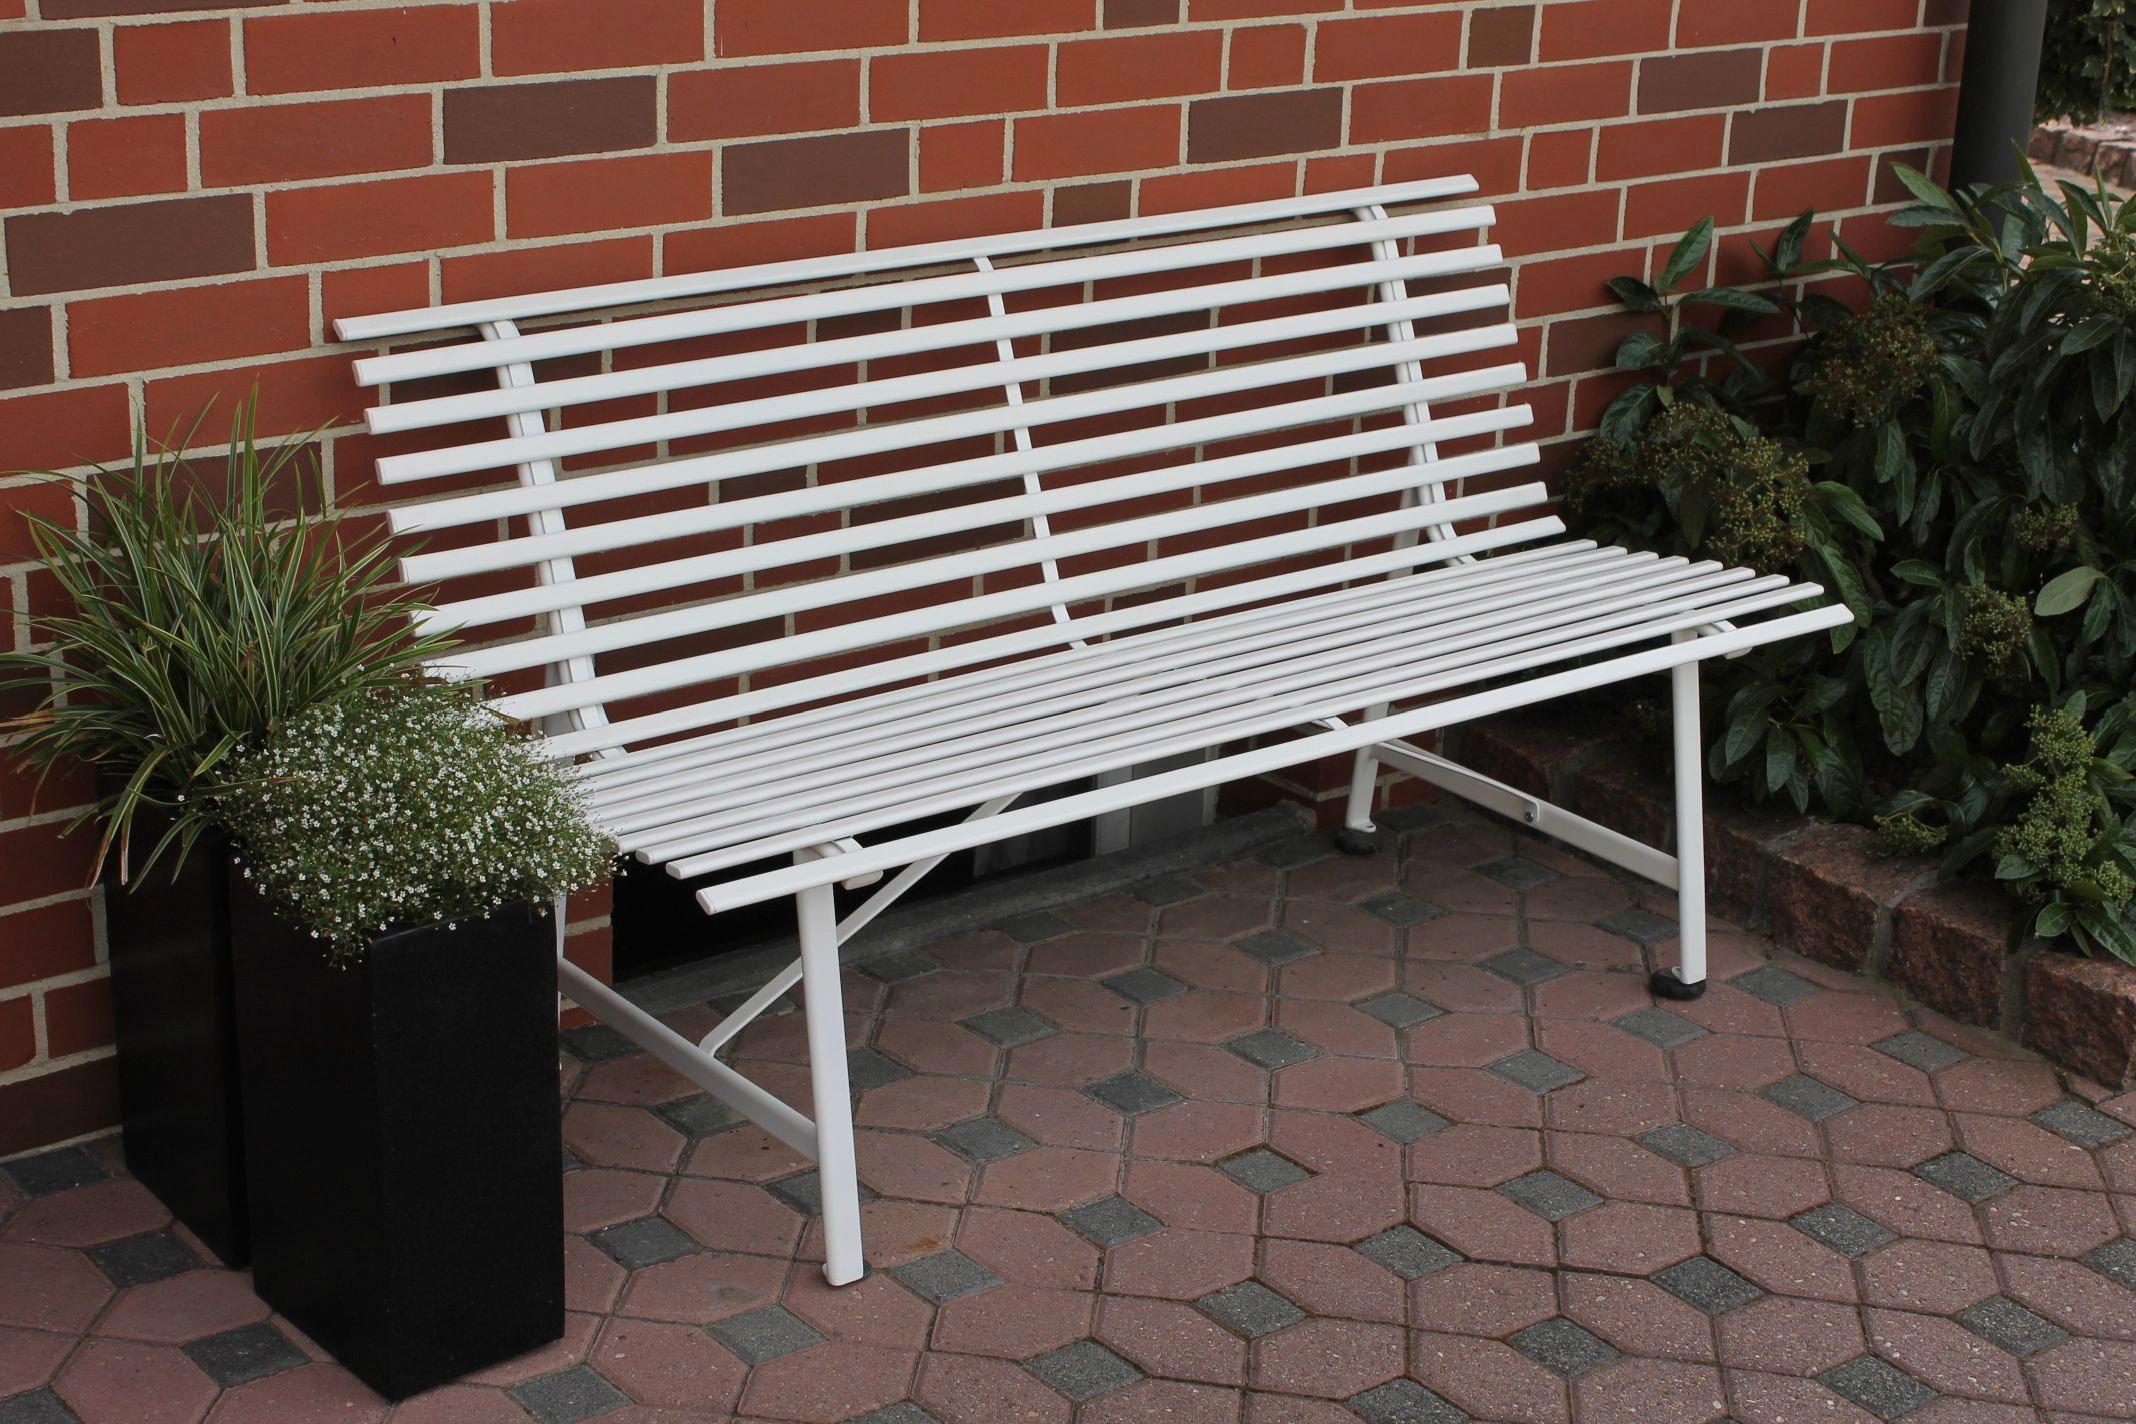 LECO Gartenbank Stahl 150x62x81 cm weiß